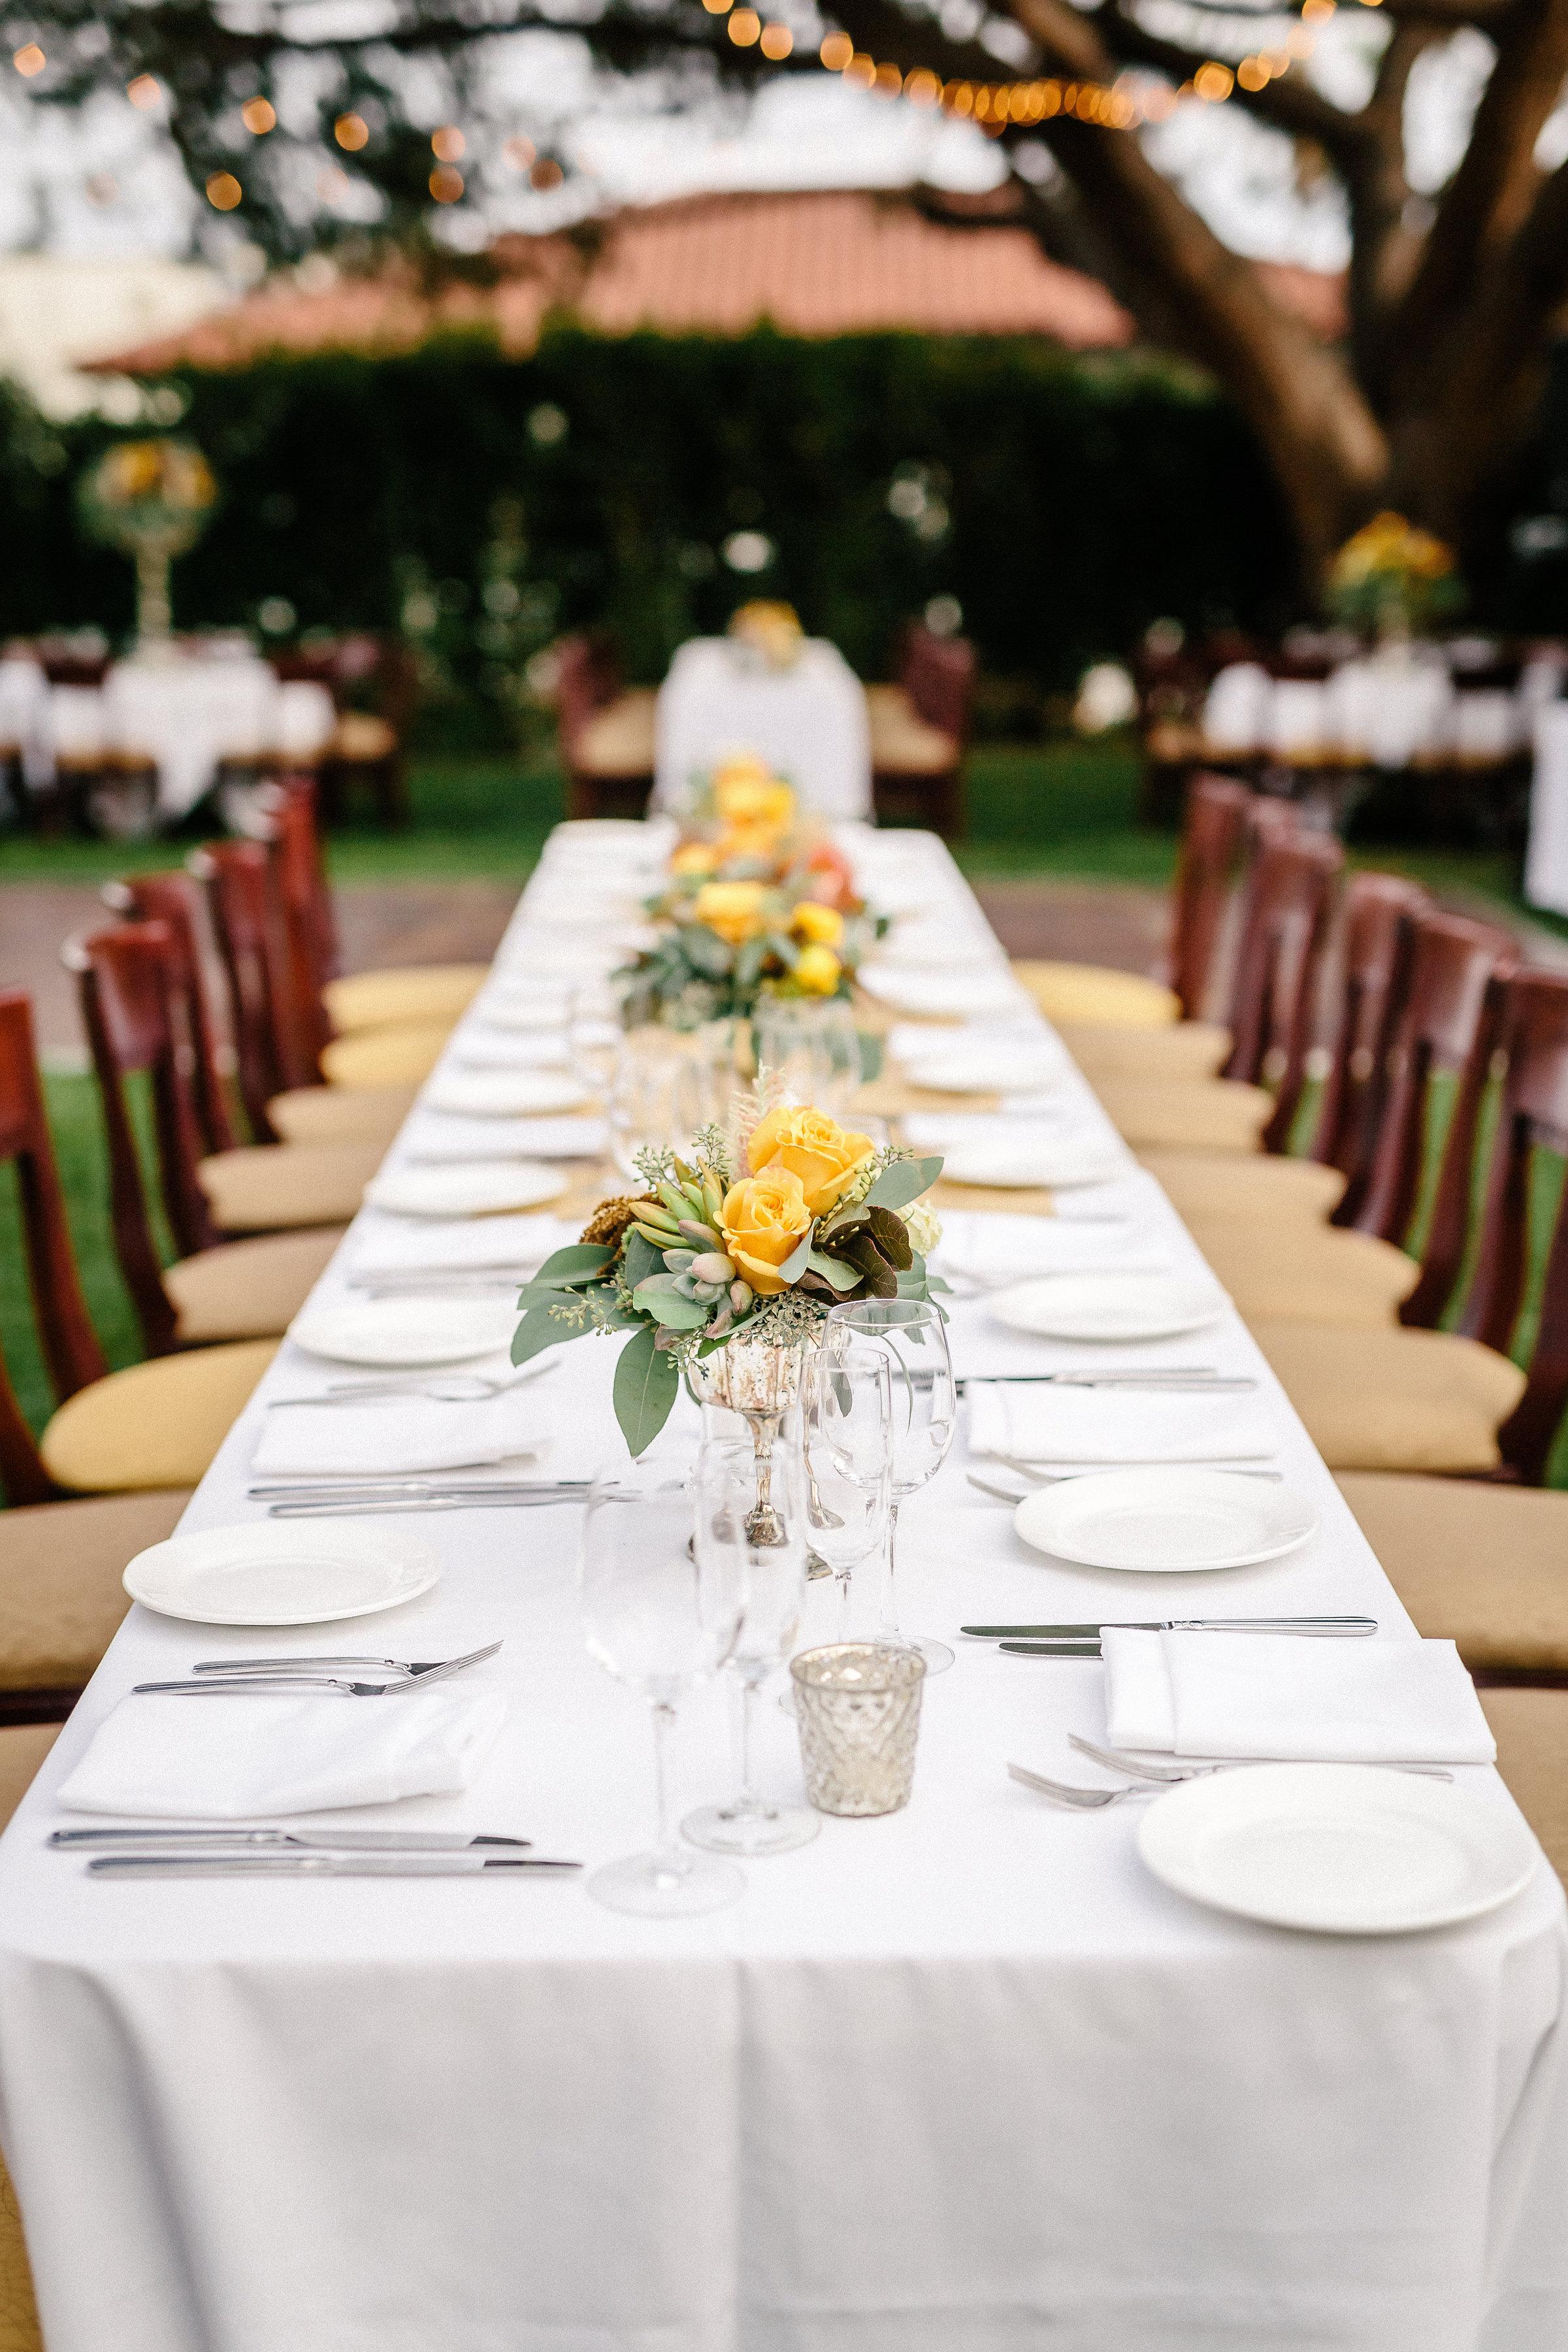 www.santabarbarawedding.com | The Riviera Mansion | Rewind Photography | Reception Table